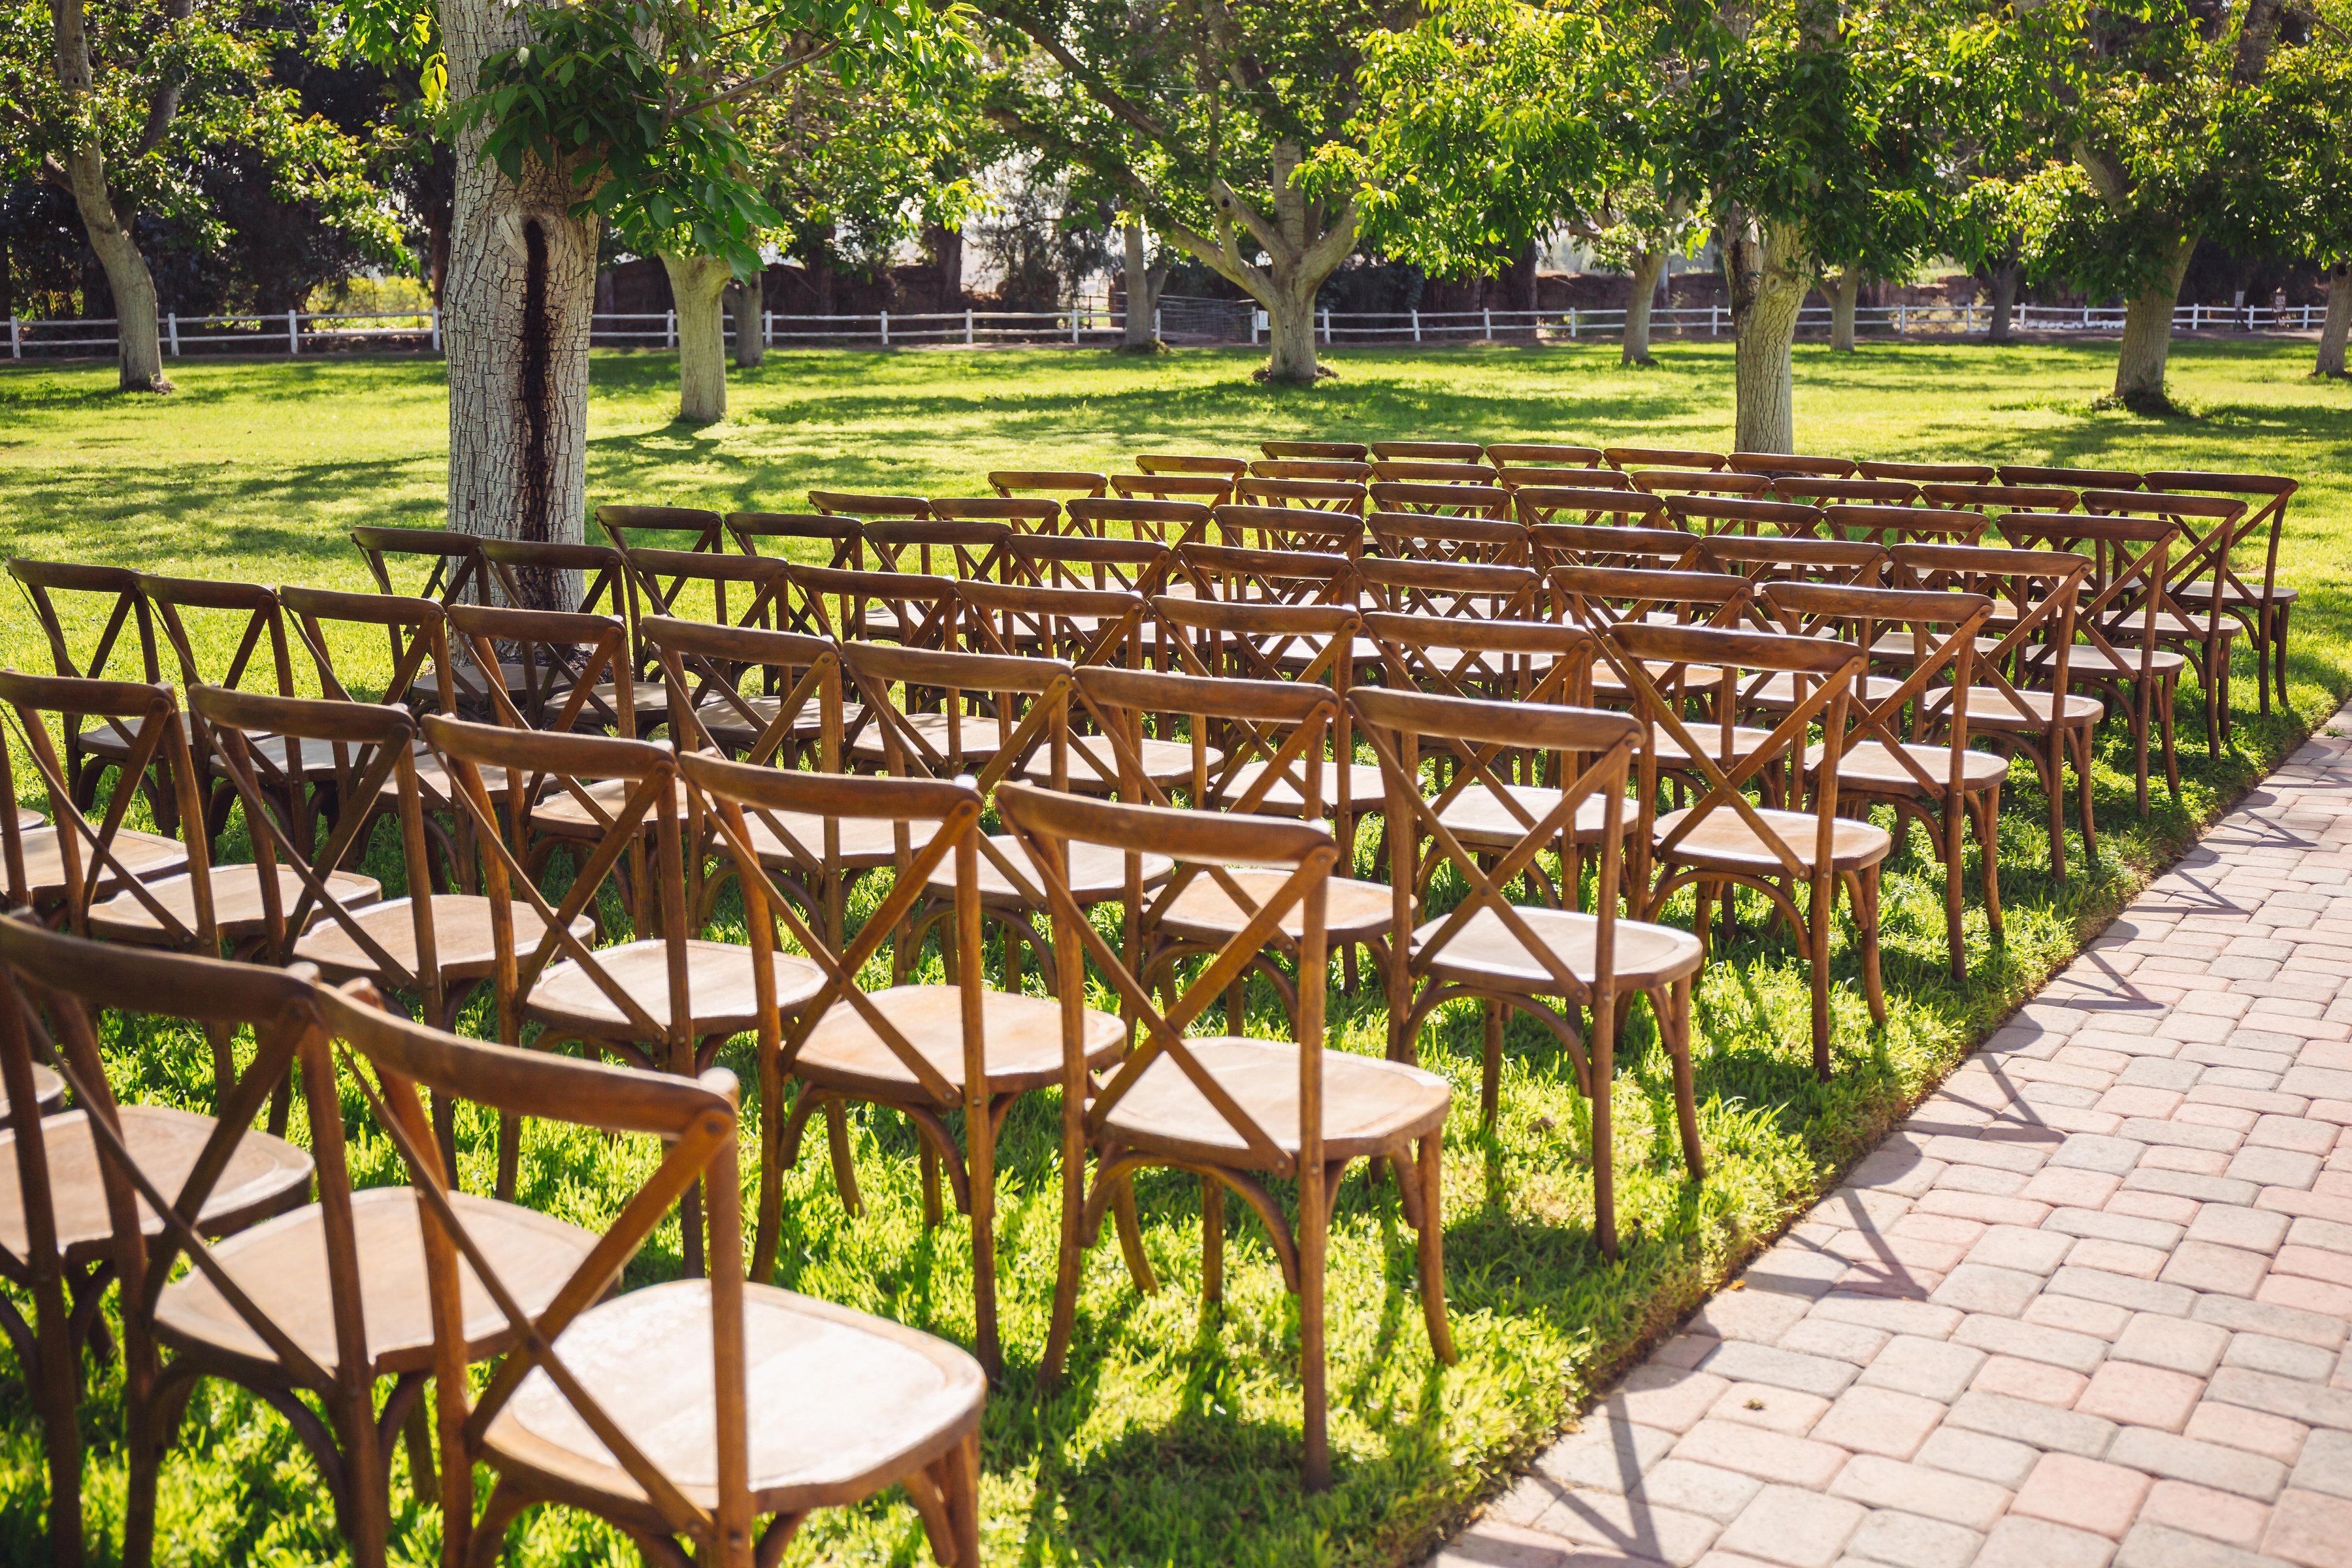 Los-angeles Wedding Themes & Ideas | PartySlate